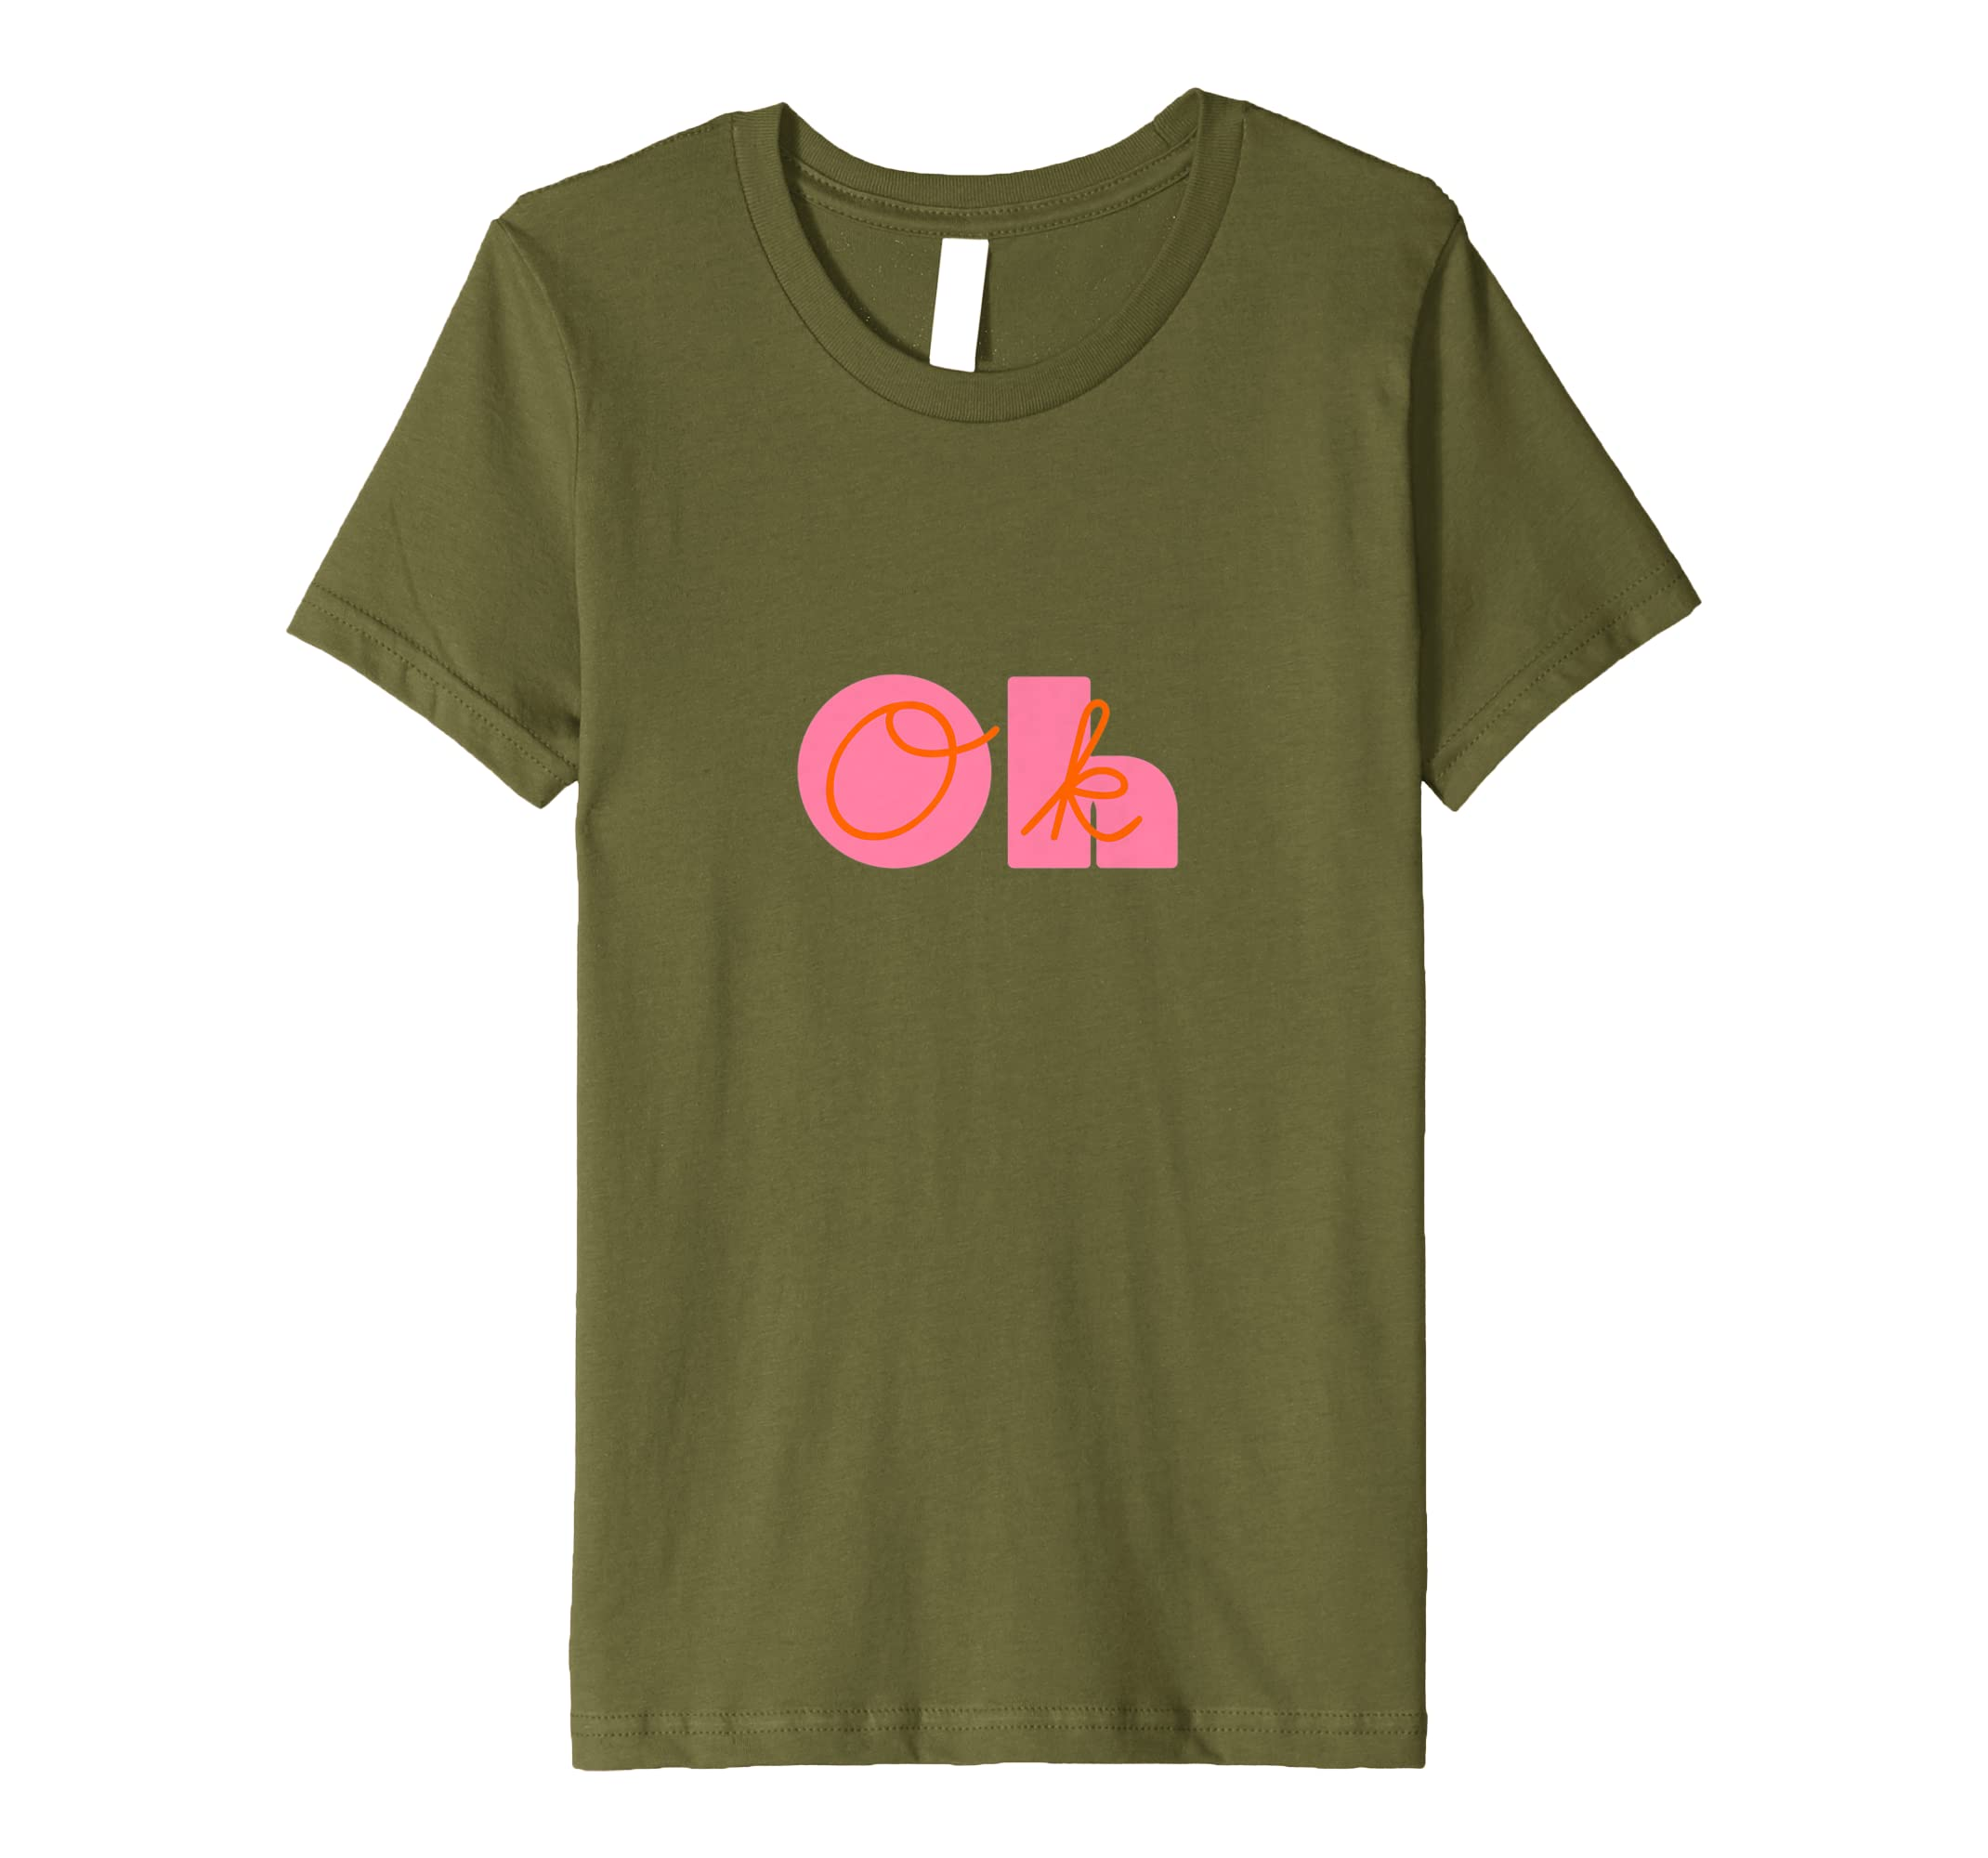 Amazon.com: Oh OK Funny Graphic Tee Slogan: Clothing